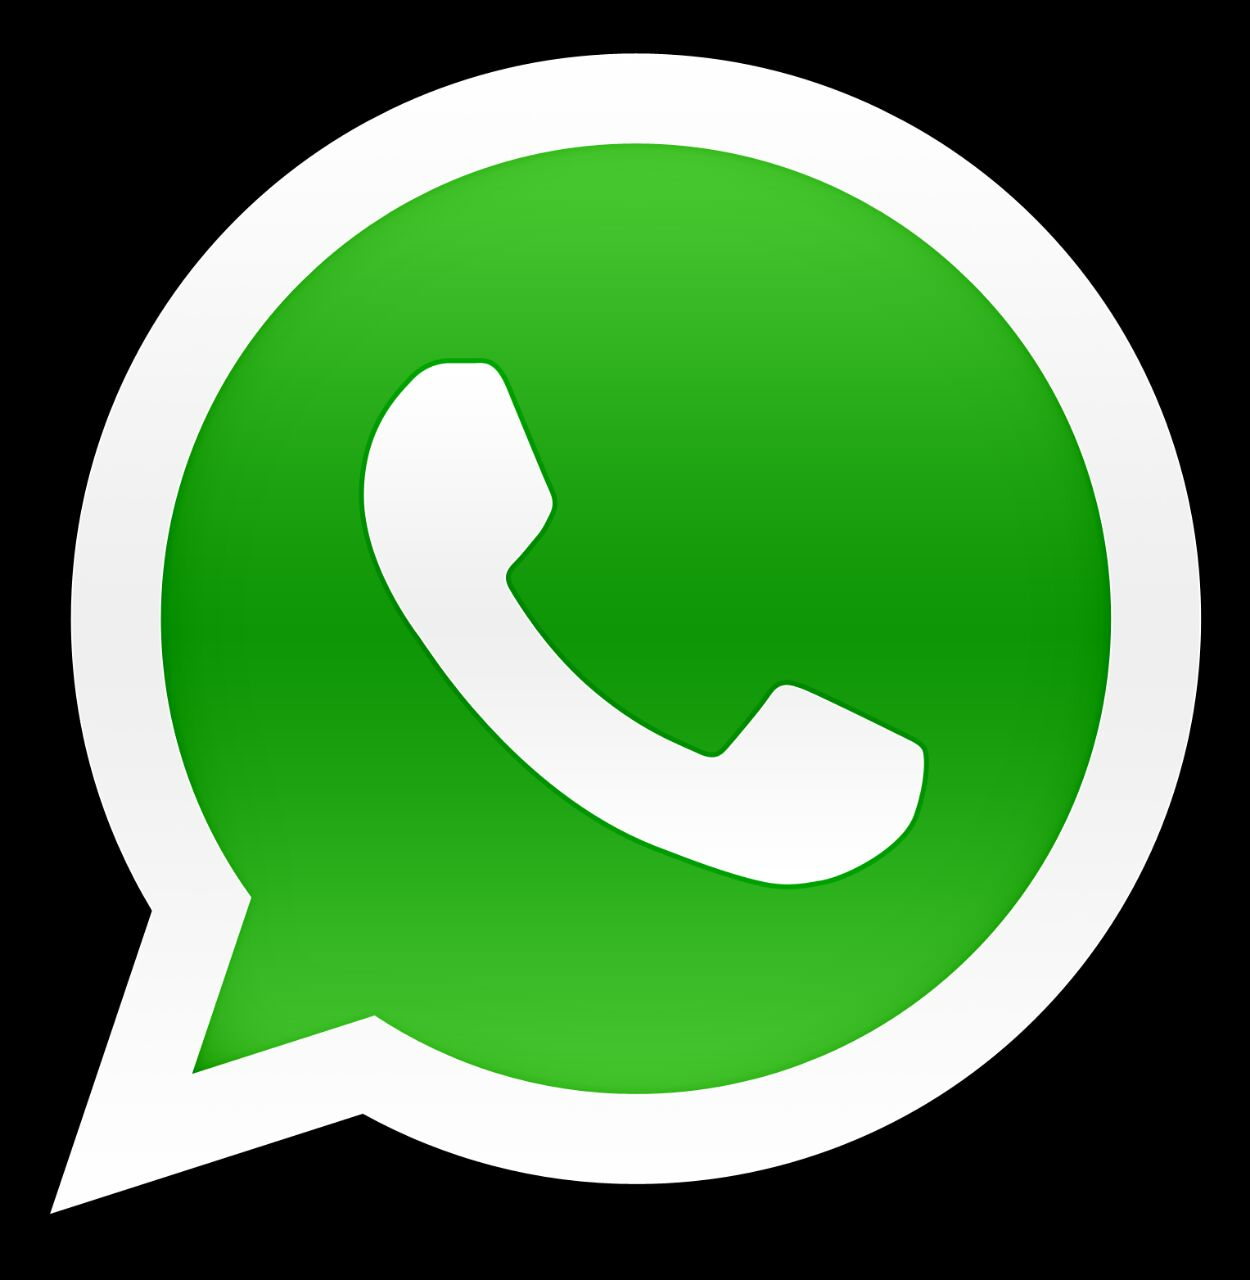 Download 3d Wallpaper Apk Whatsapp Transparente Masterdroidd